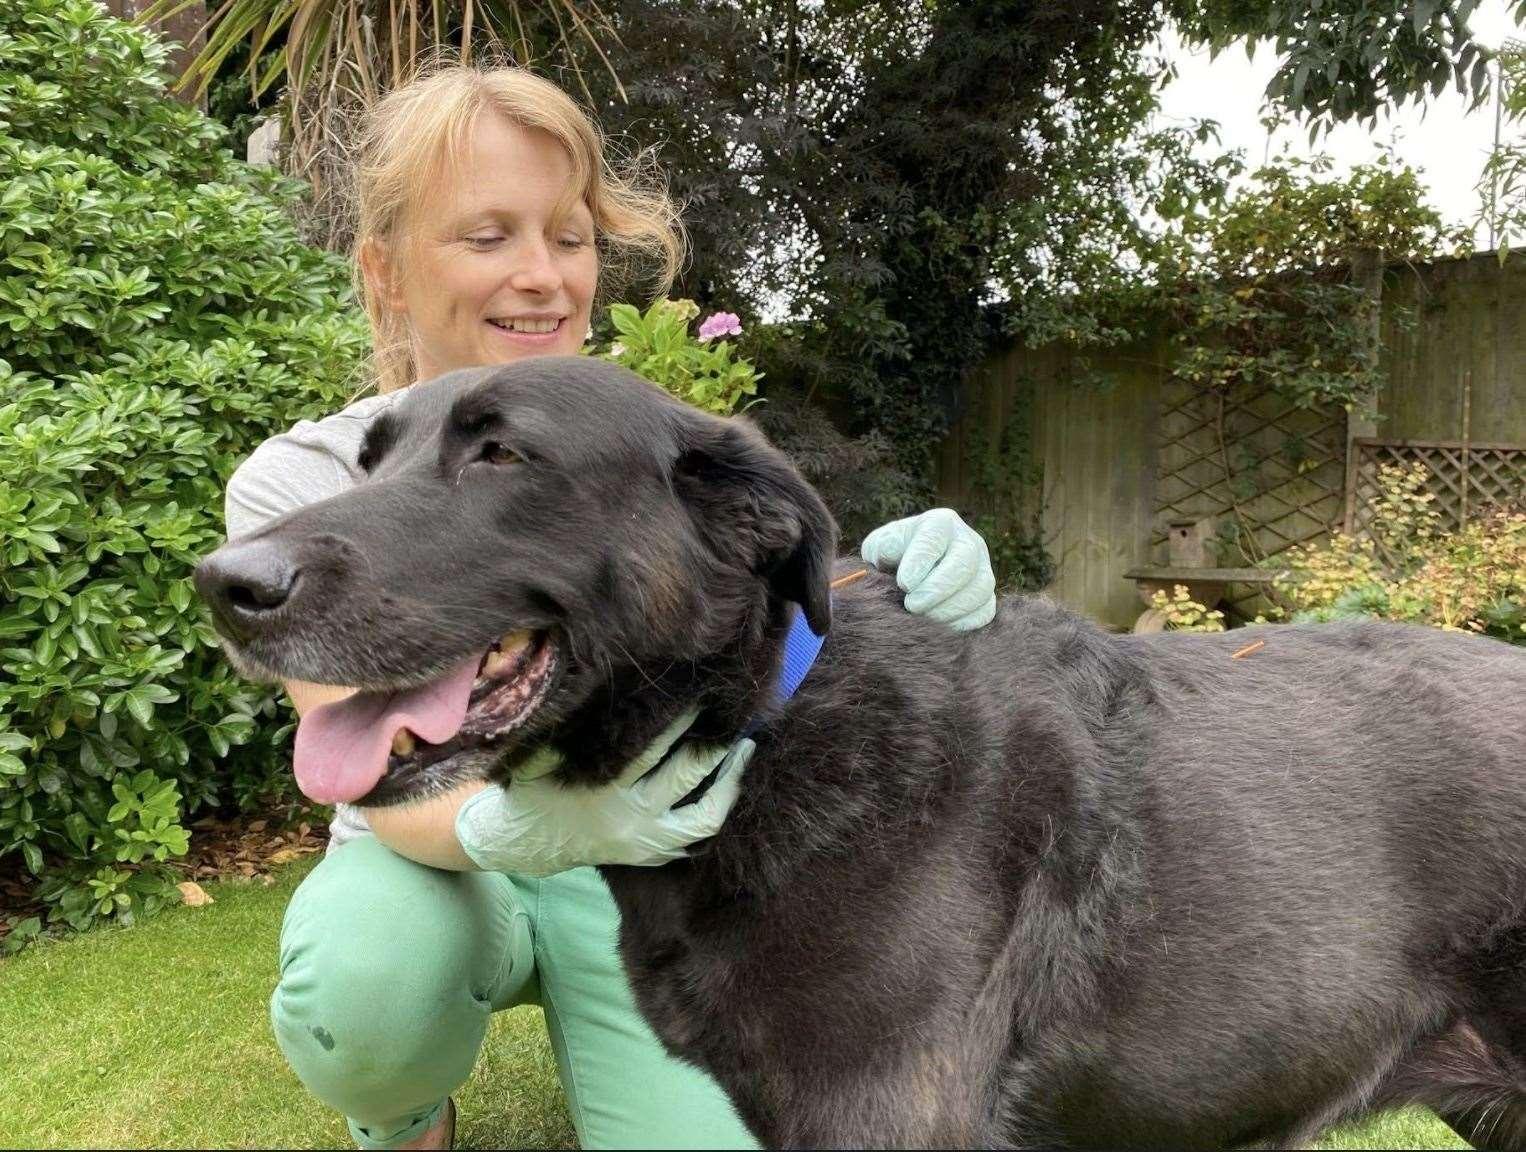 Carole with senior pooch Tilly.